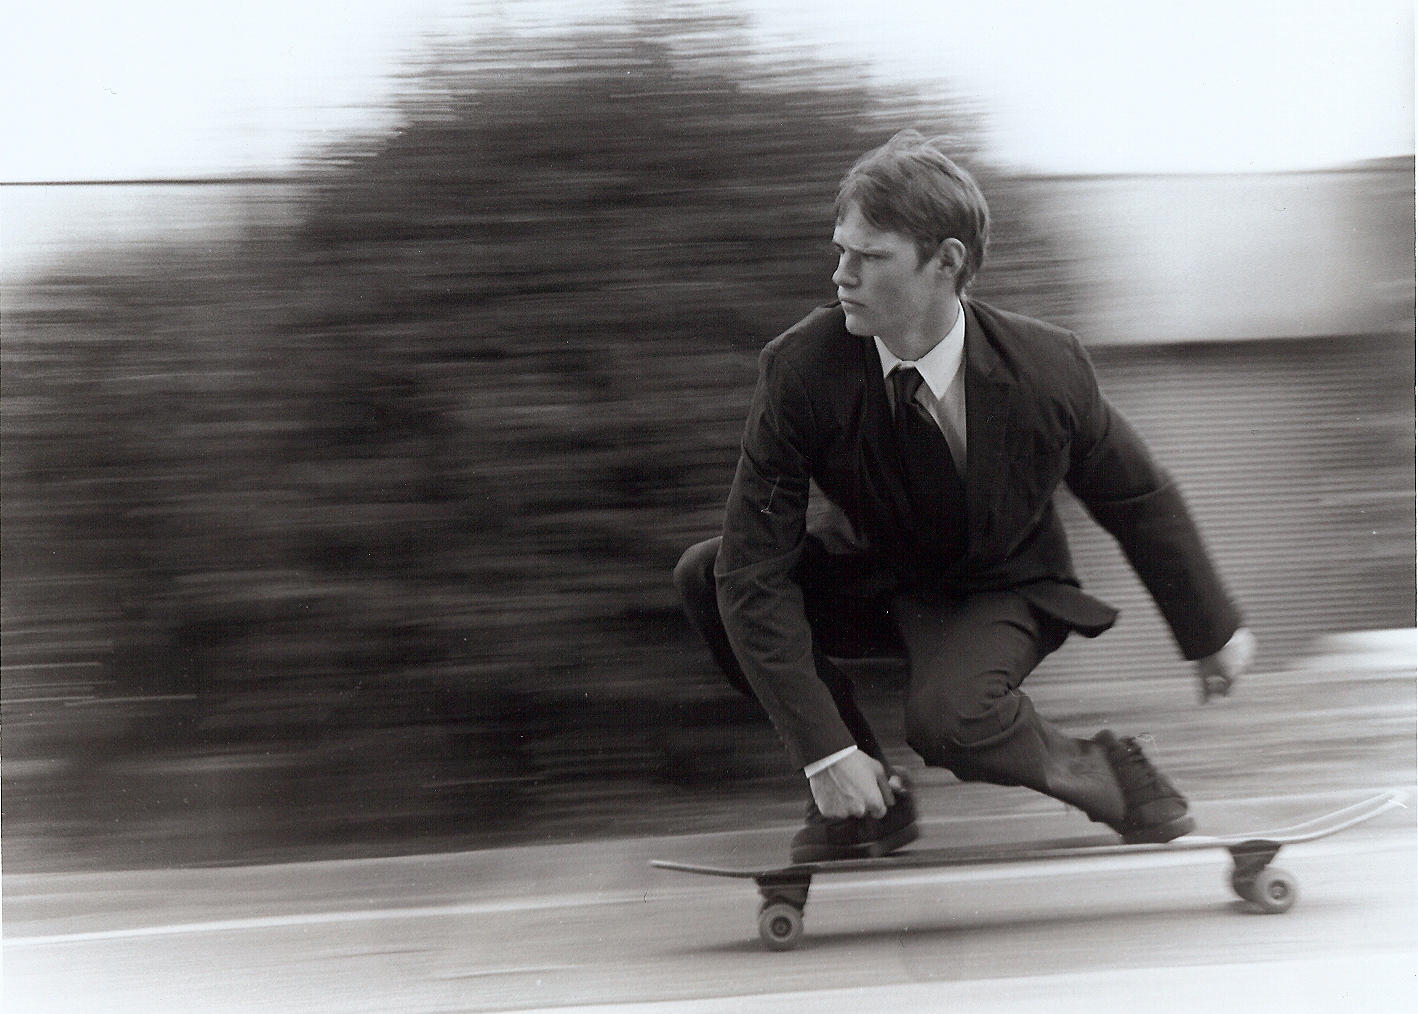 skateboarding businessman by sonofdirk